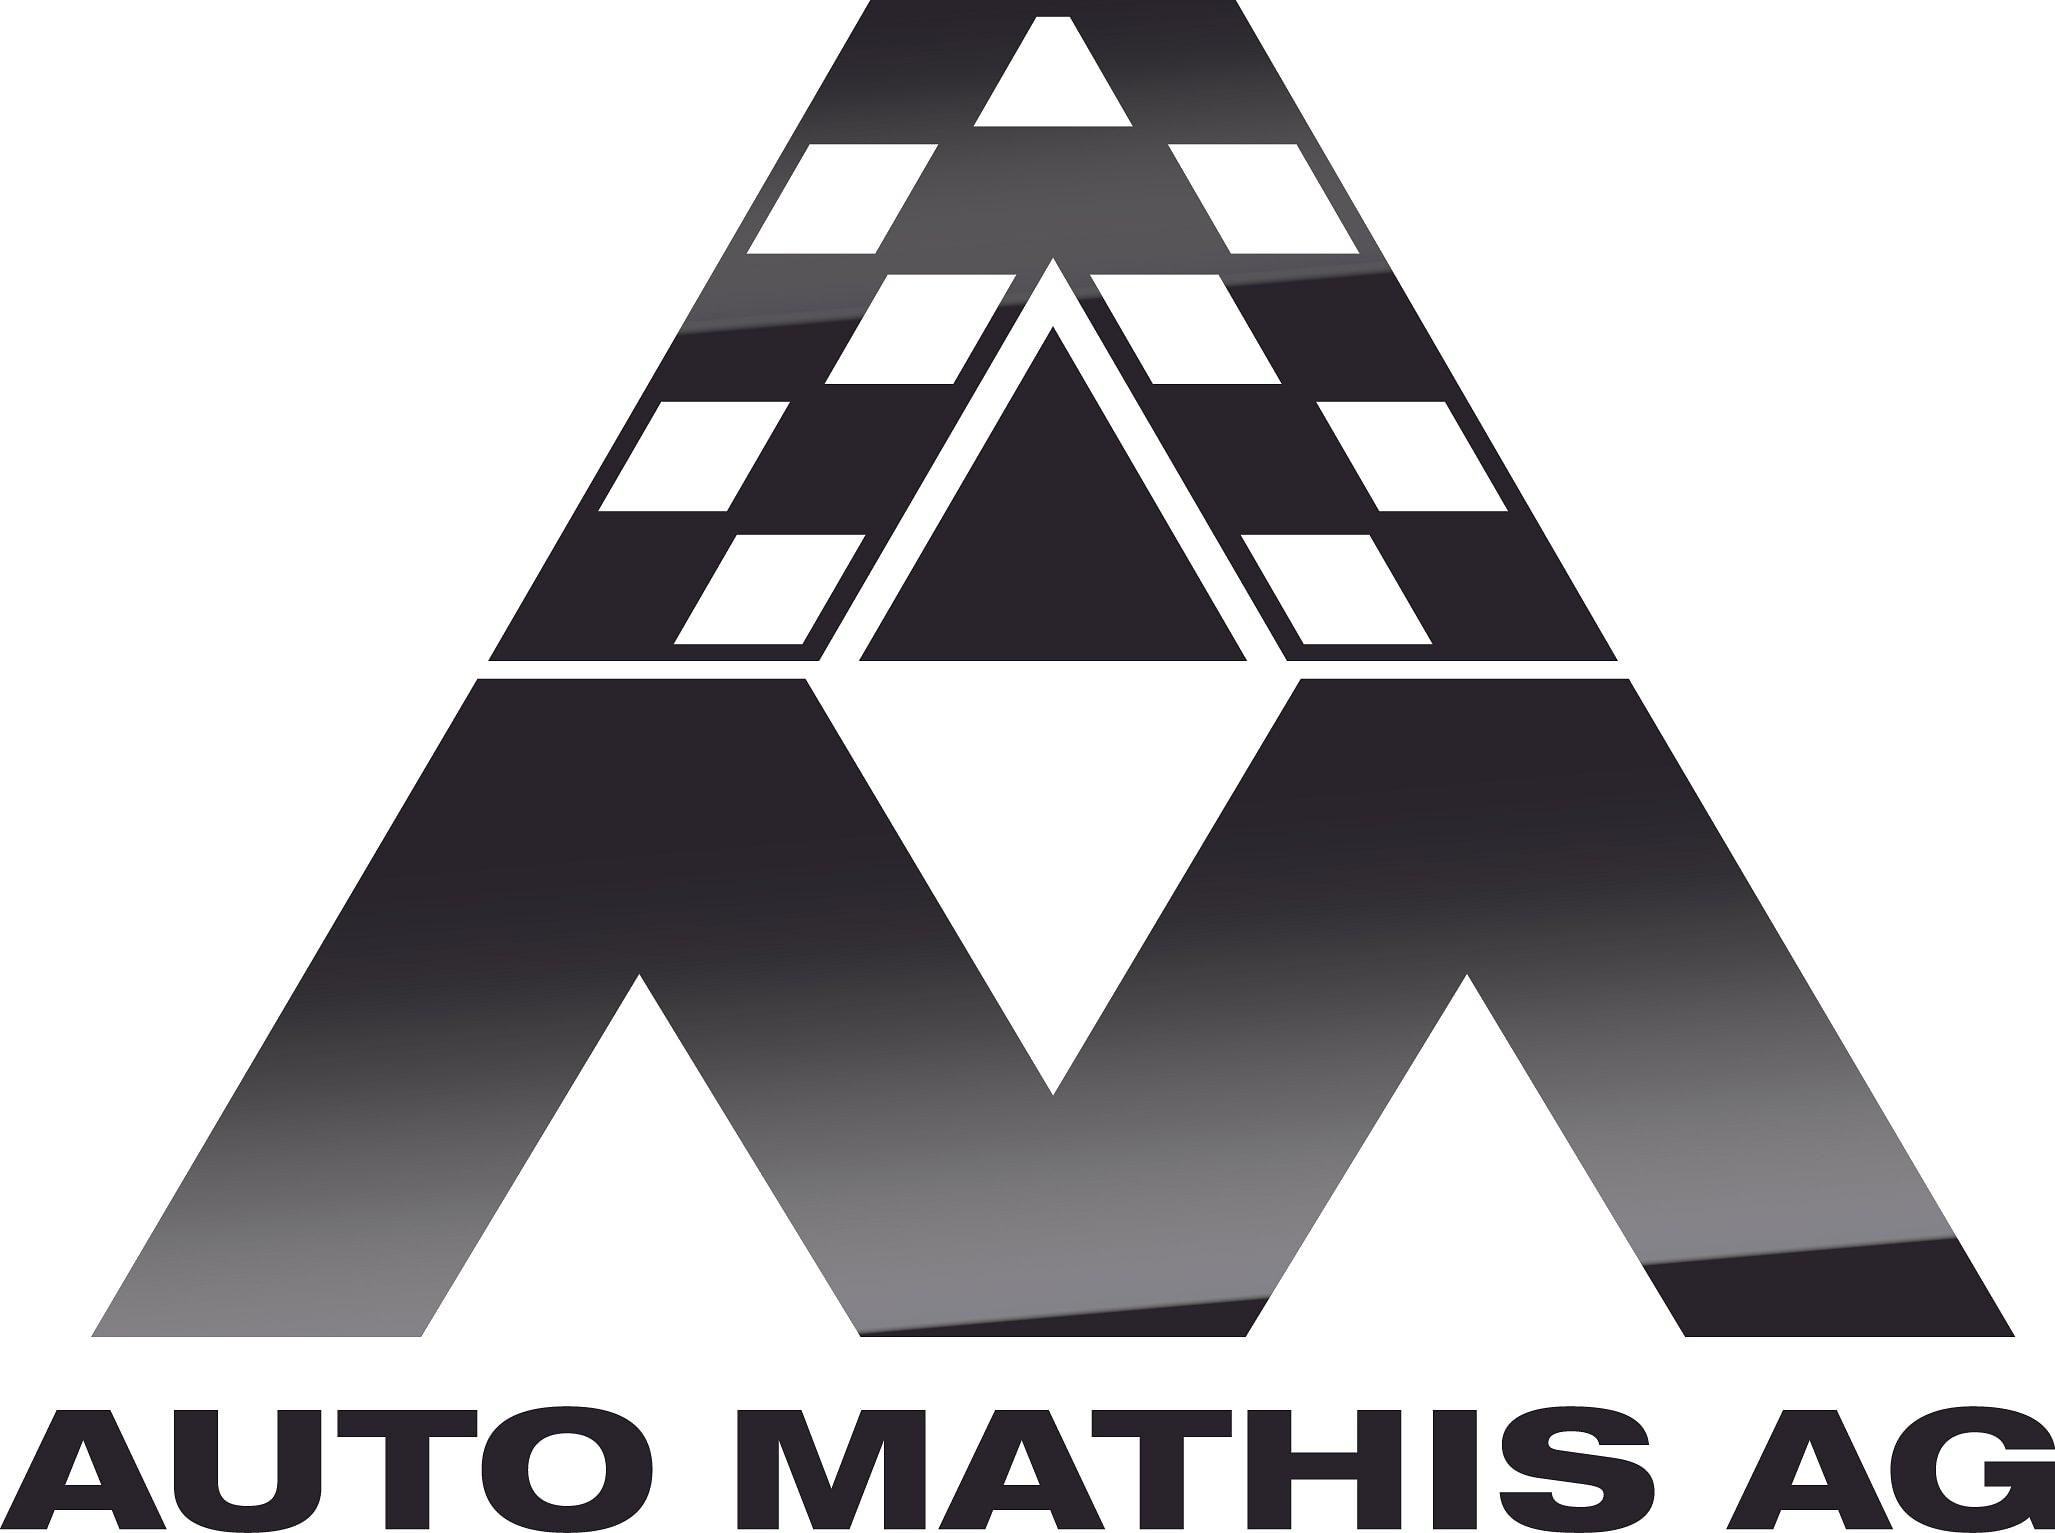 Auto Mathis AG